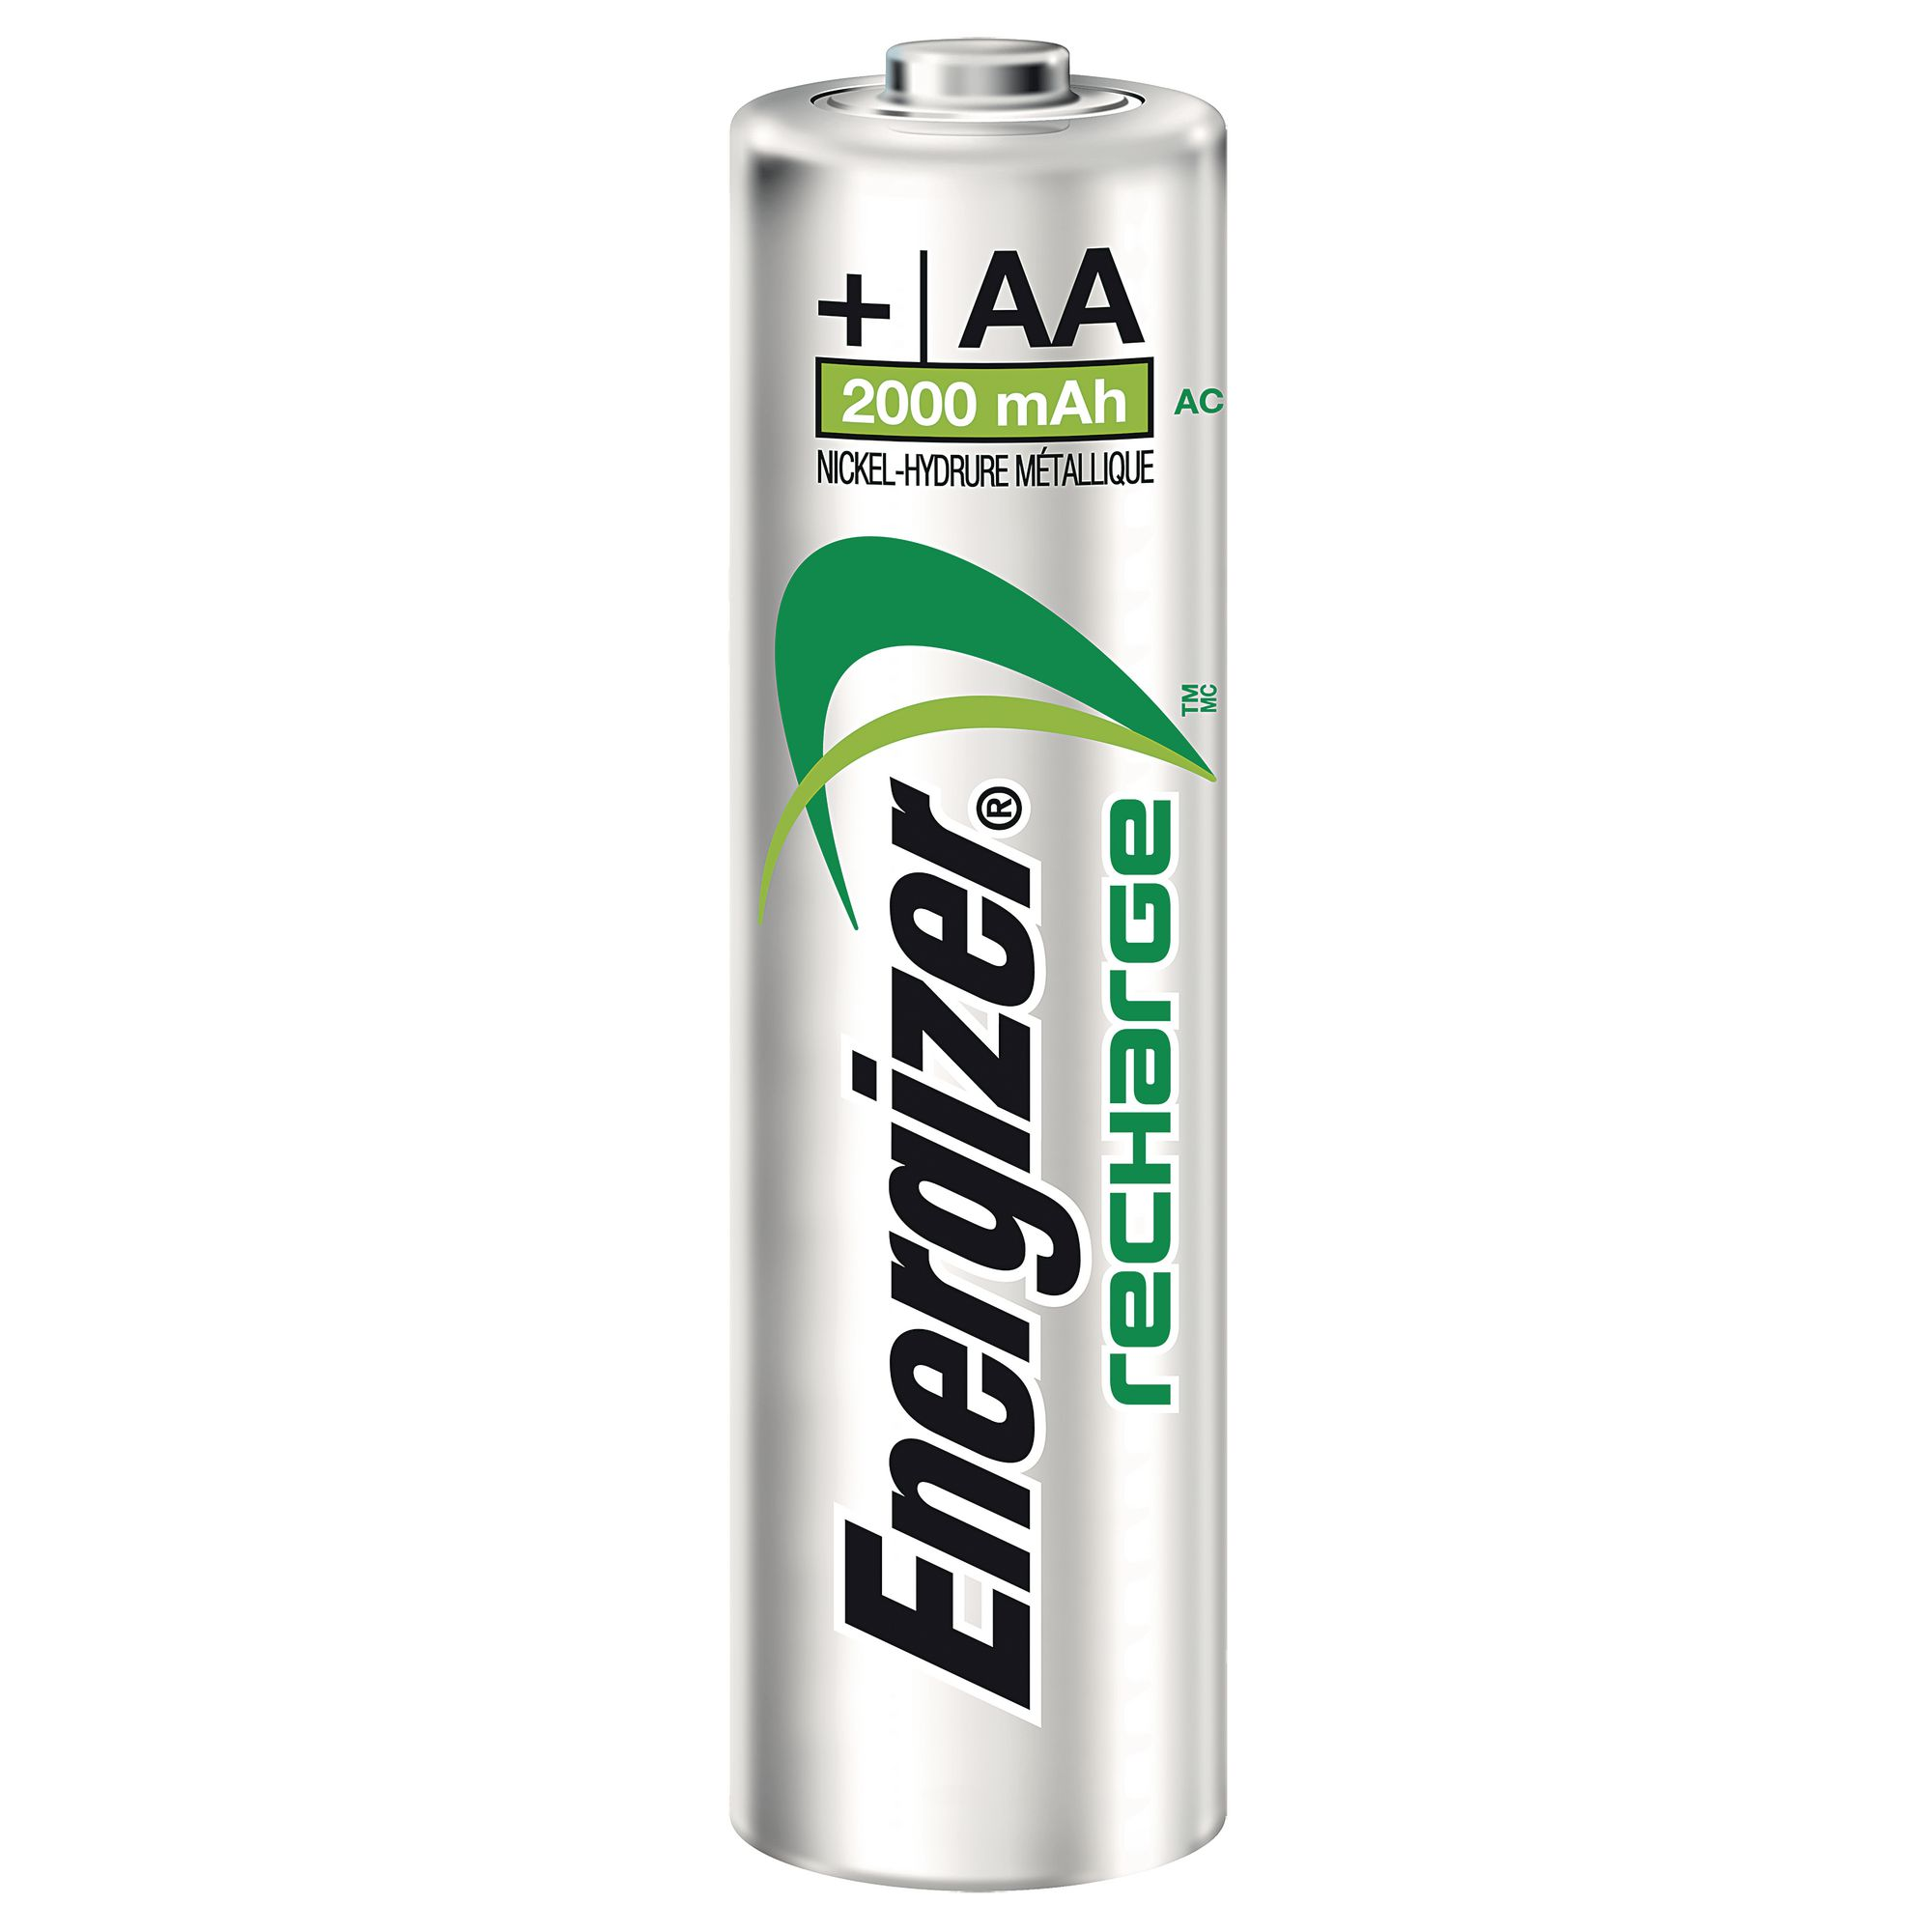 Nickel Metal Hydride Battery >> Rechargeable Nickel Metal Hydride Battery Aa Hr6